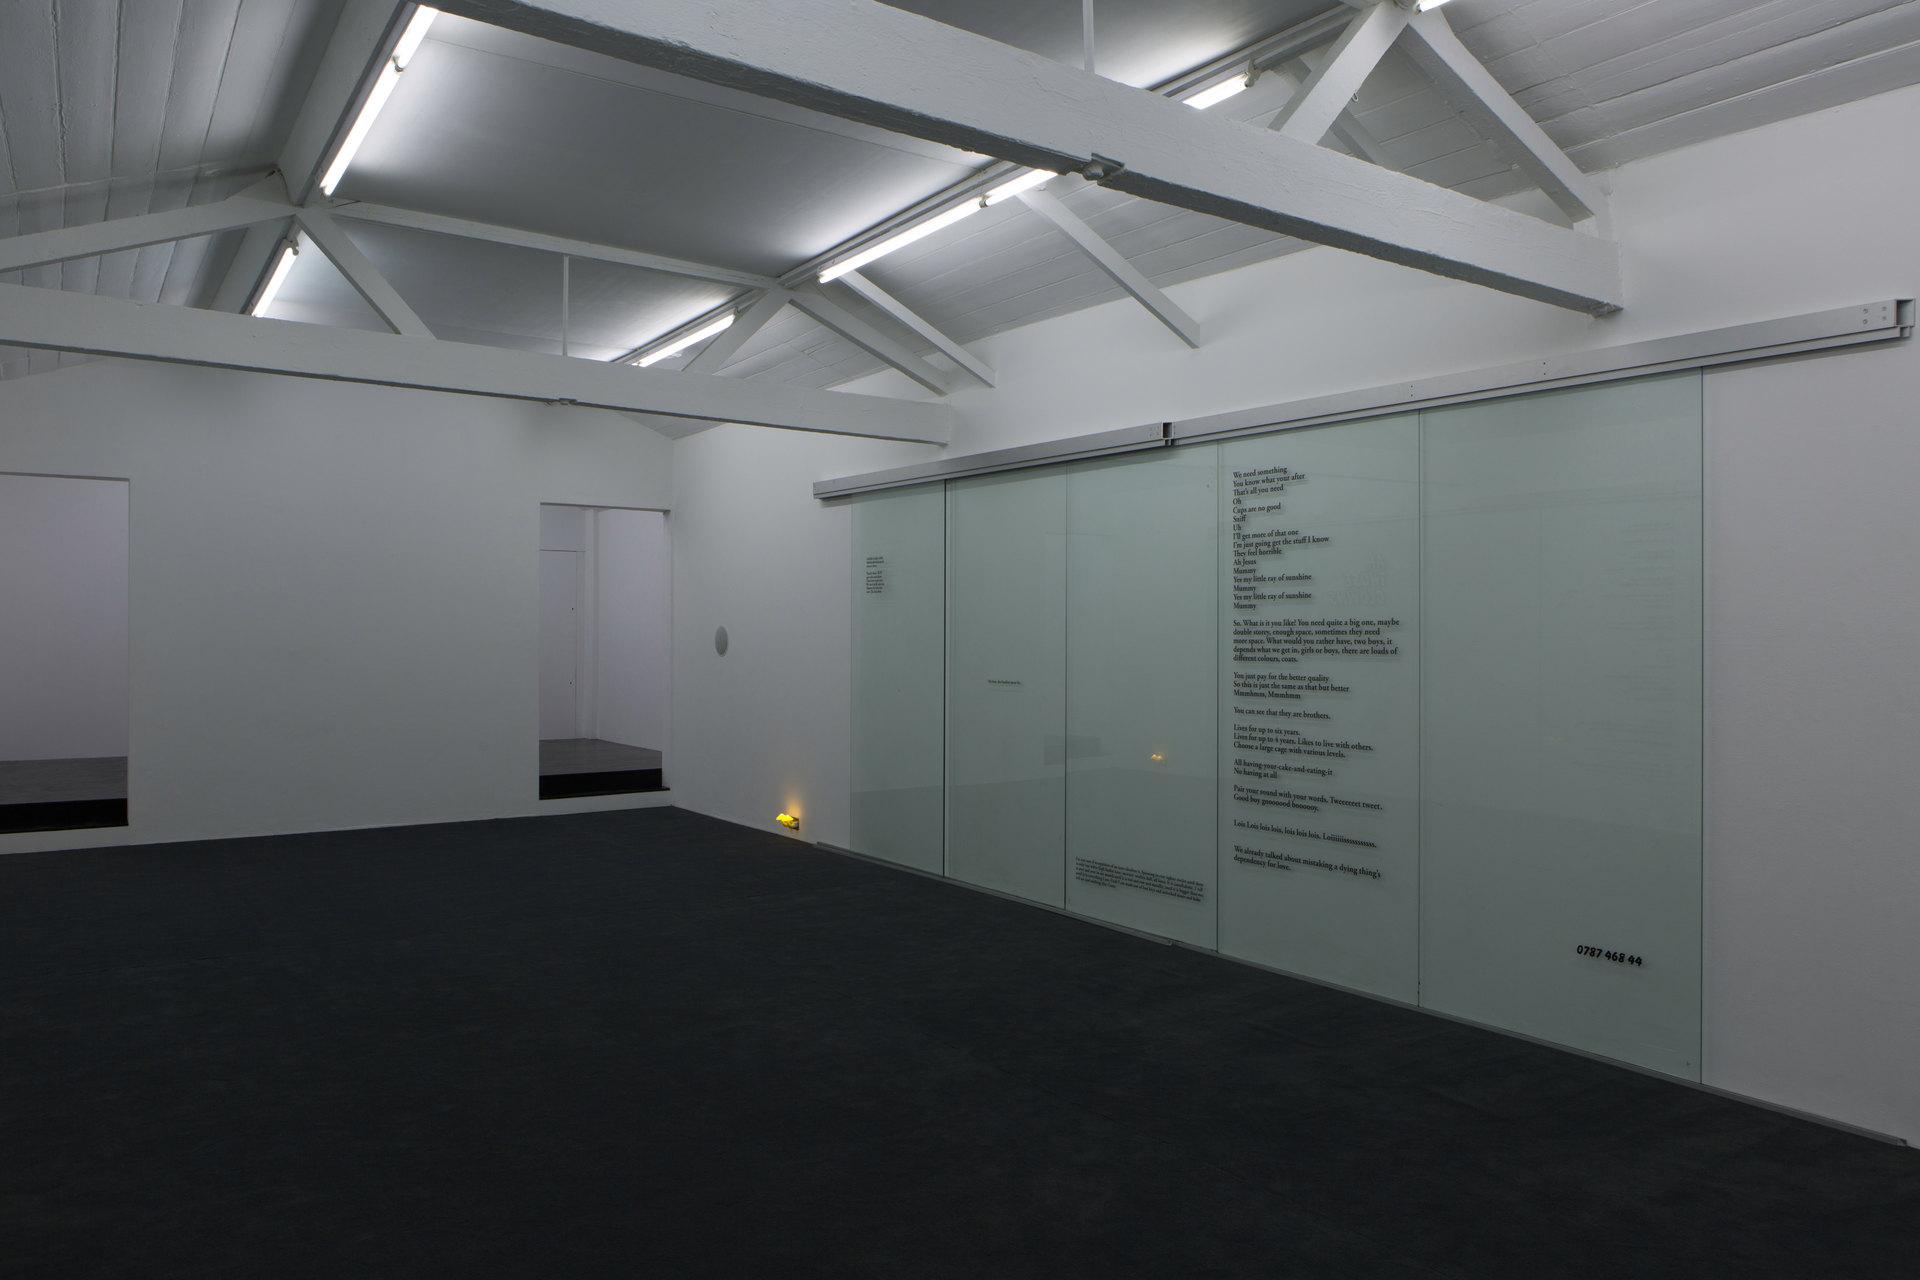 Saskia / Libs / Roundabout / Kind / Thirteen, 2016, Ghislaine Leung, Cell Project Space